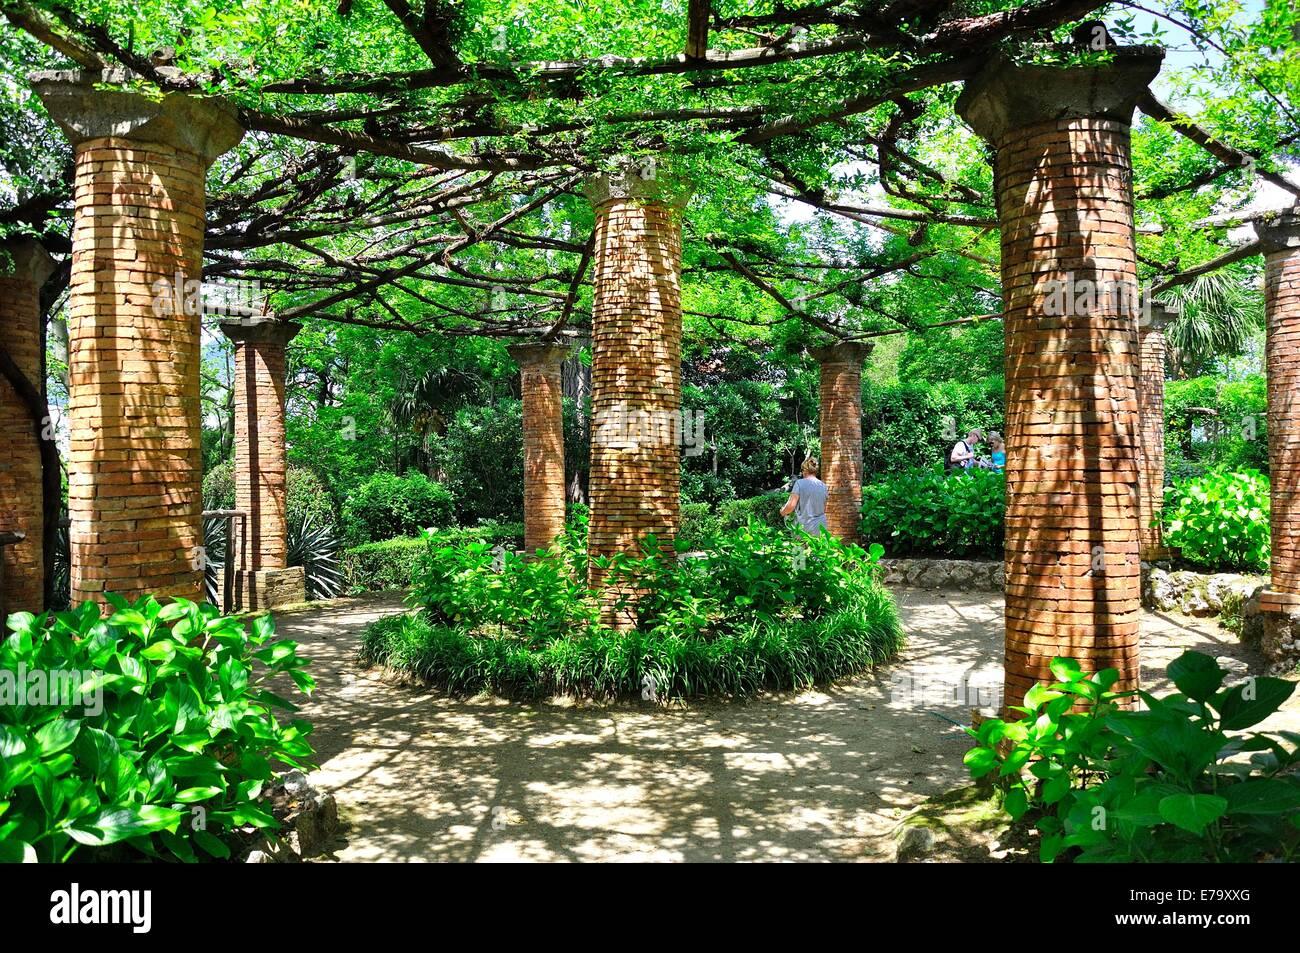 La Hortensia Avenue, en los jardines de Villa Cimbrone, Ravello, Italia Foto de stock